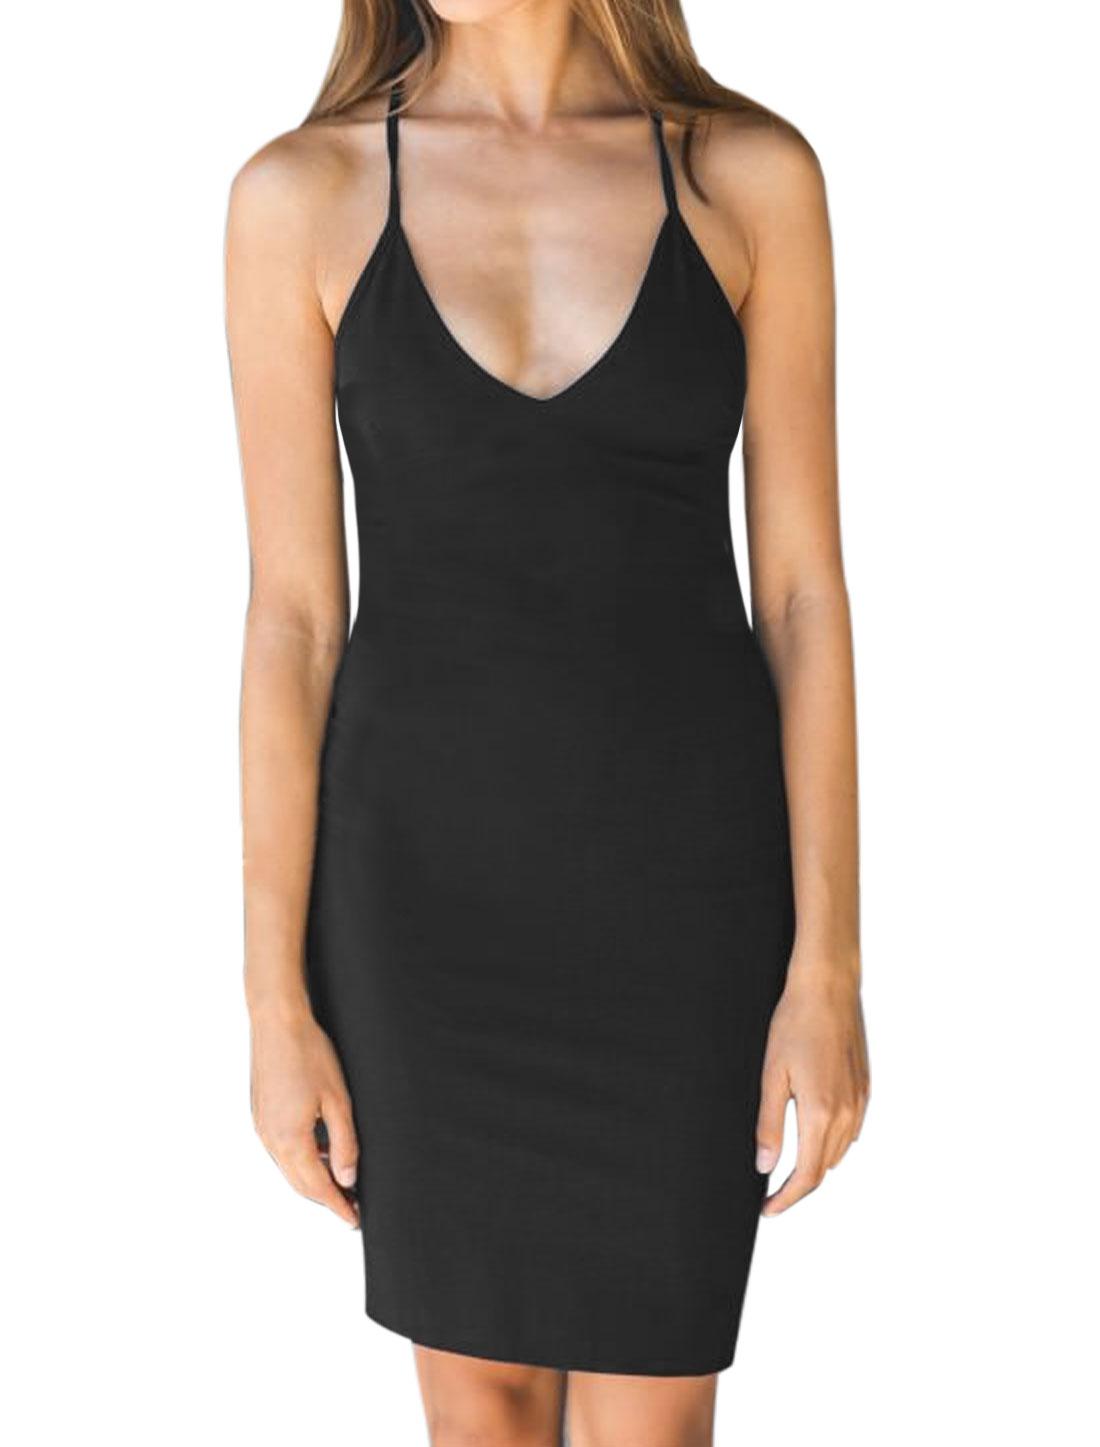 Women Deep V Neck Sleeveless Self Tie Strappy Back Sheath Dress Black XS